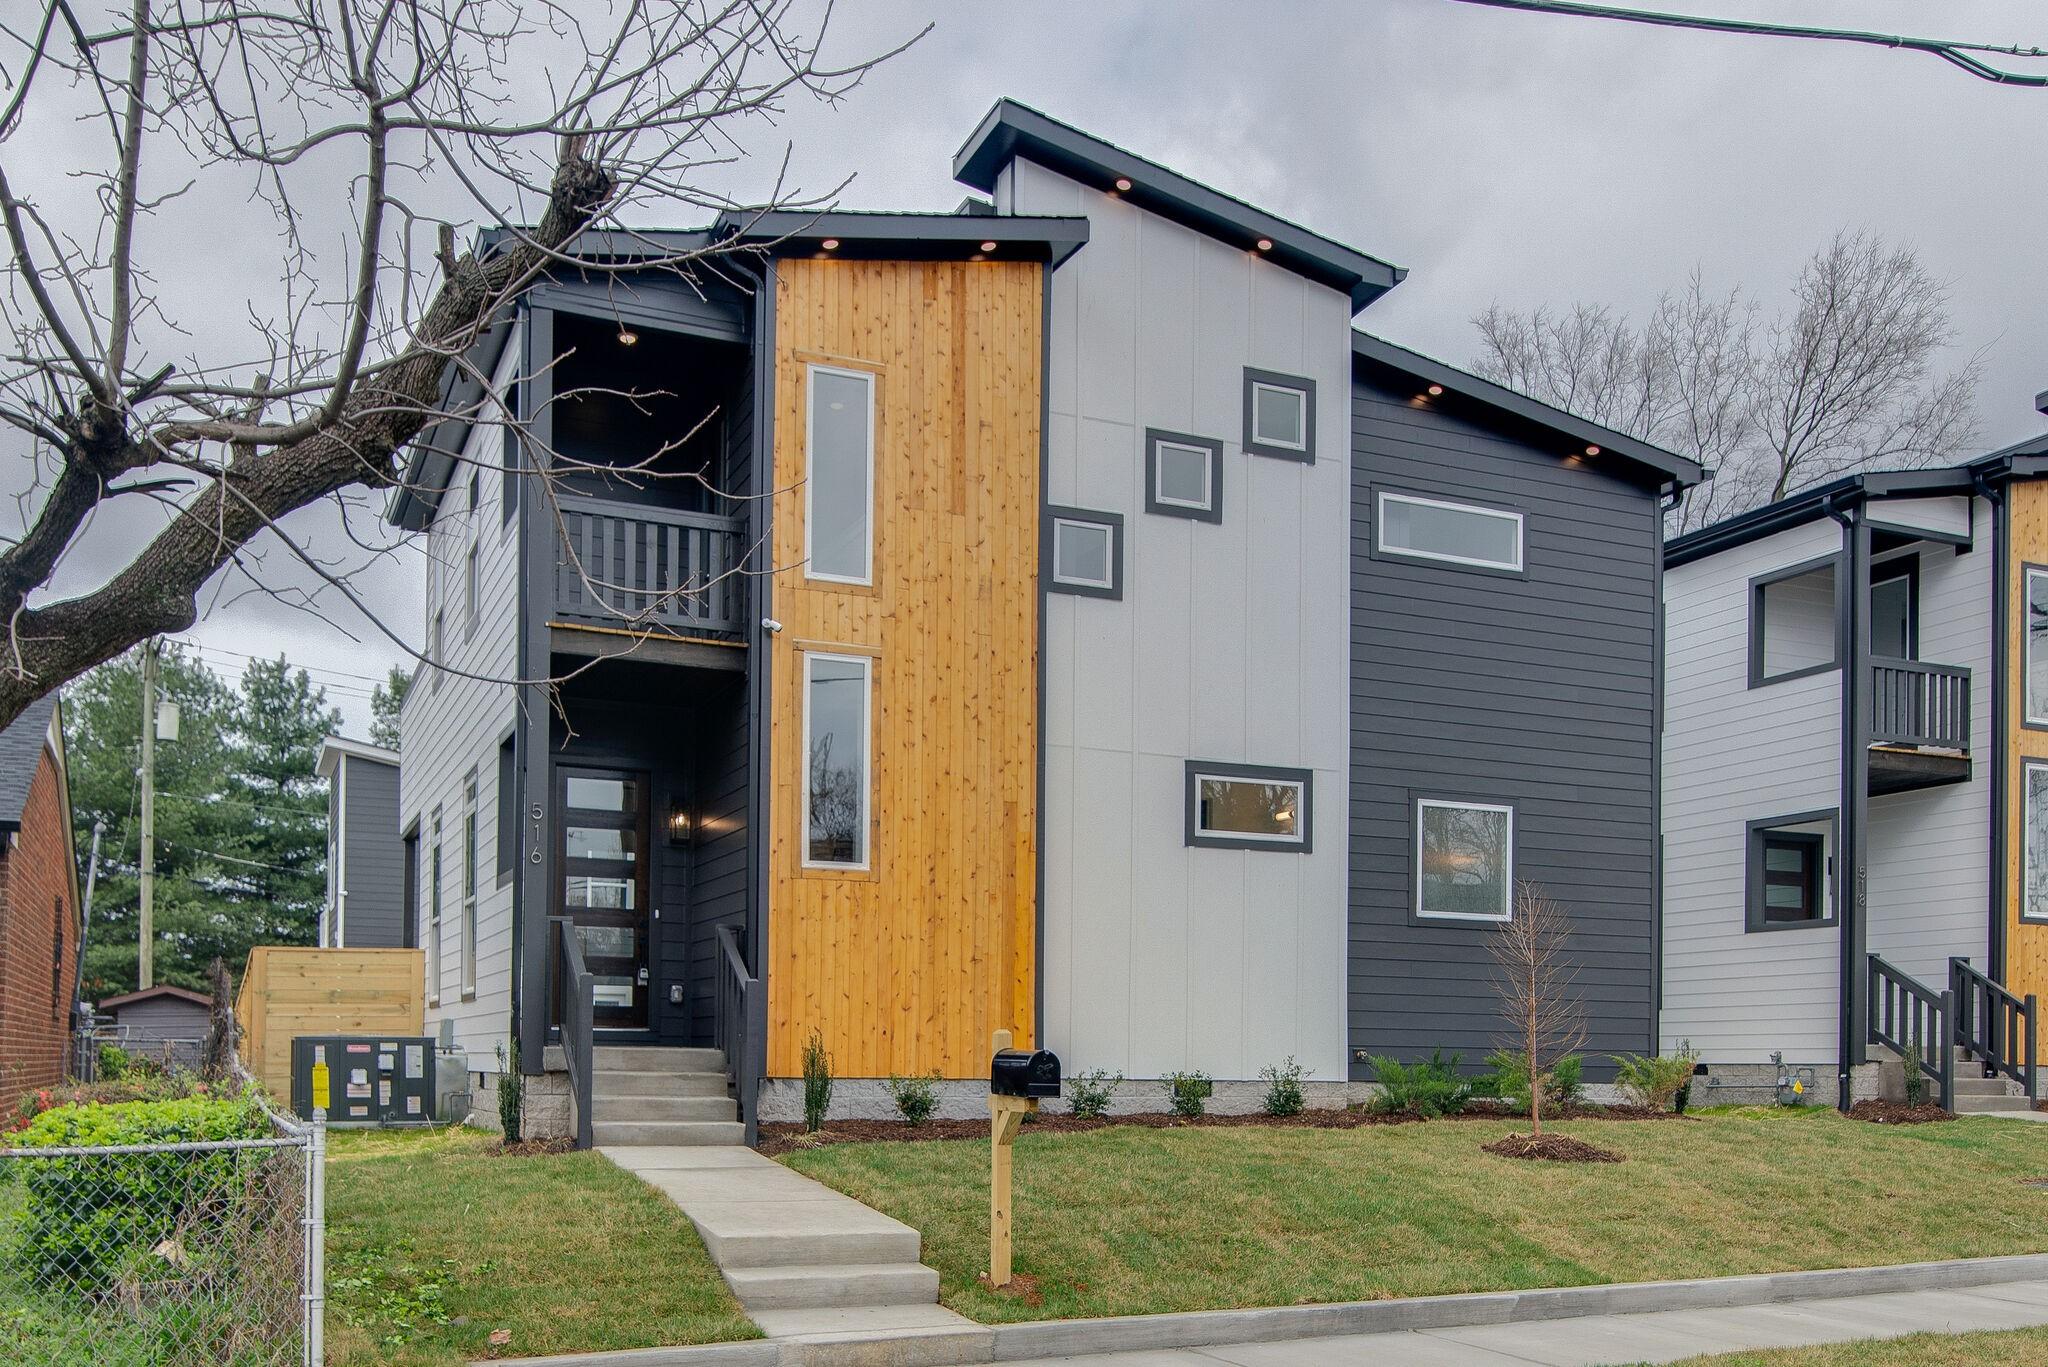 516 N 2nd St Property Photo - Nashville, TN real estate listing